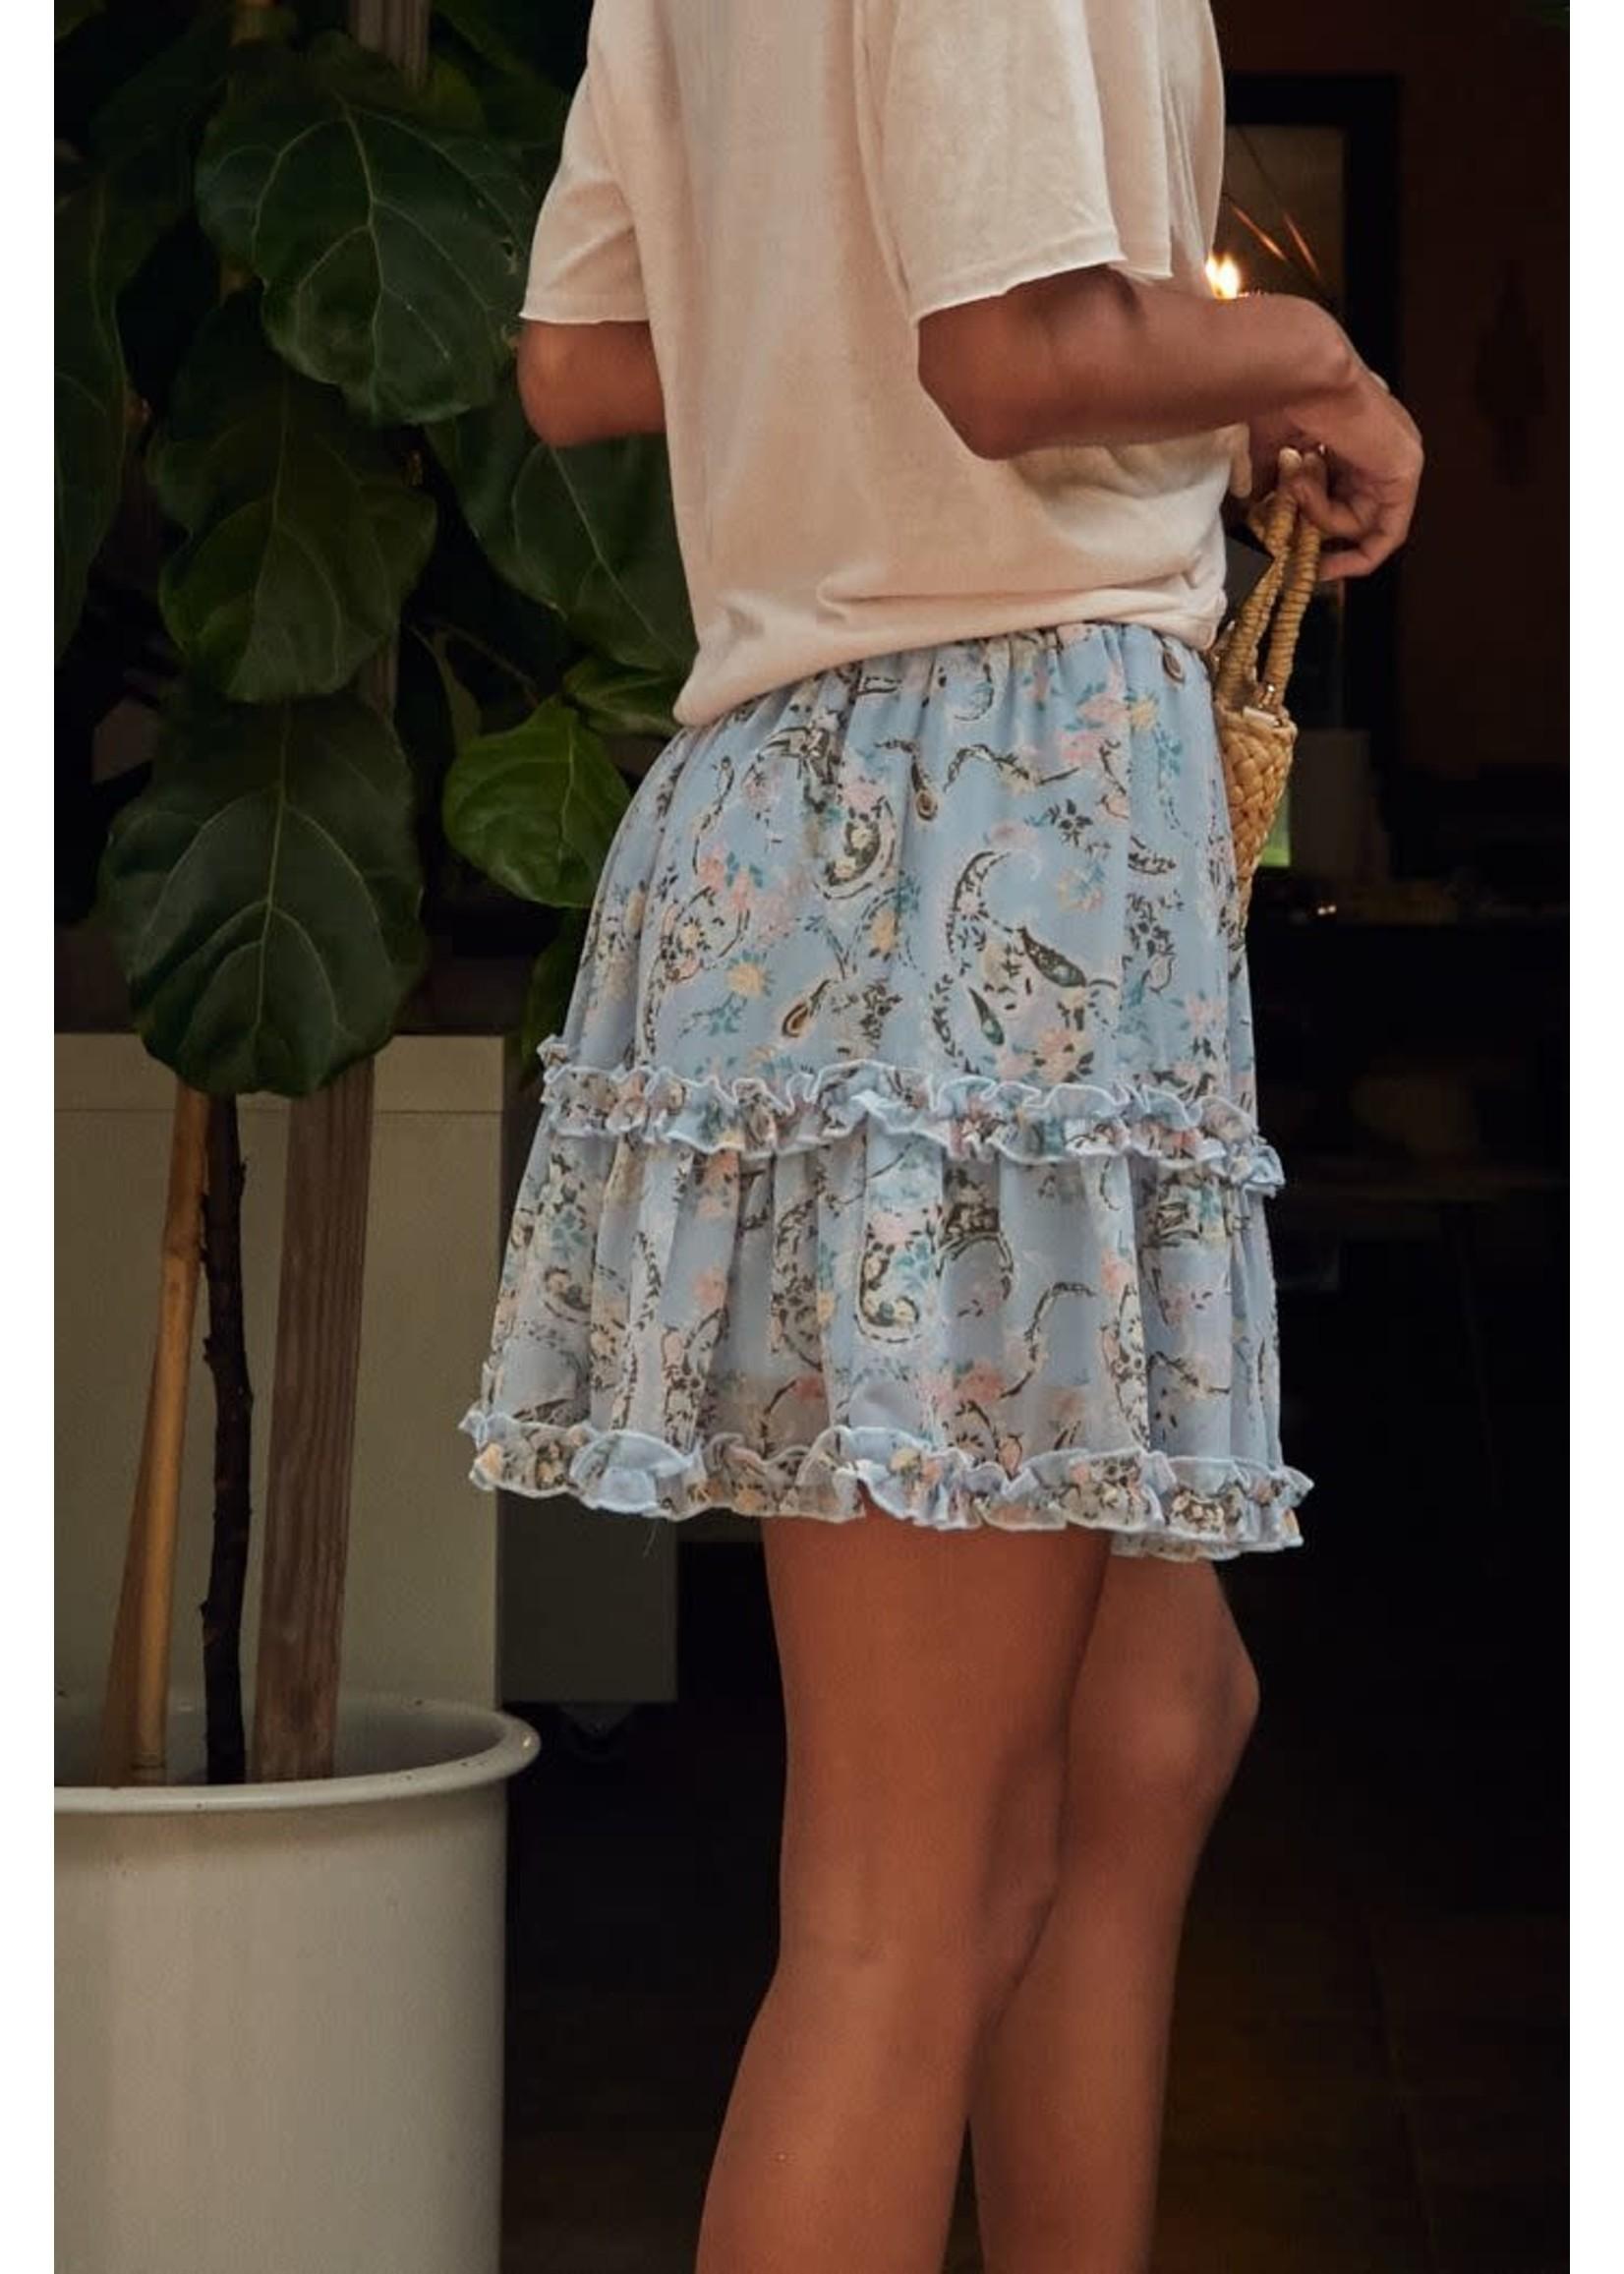 Sadie Sage Kiss Skirt